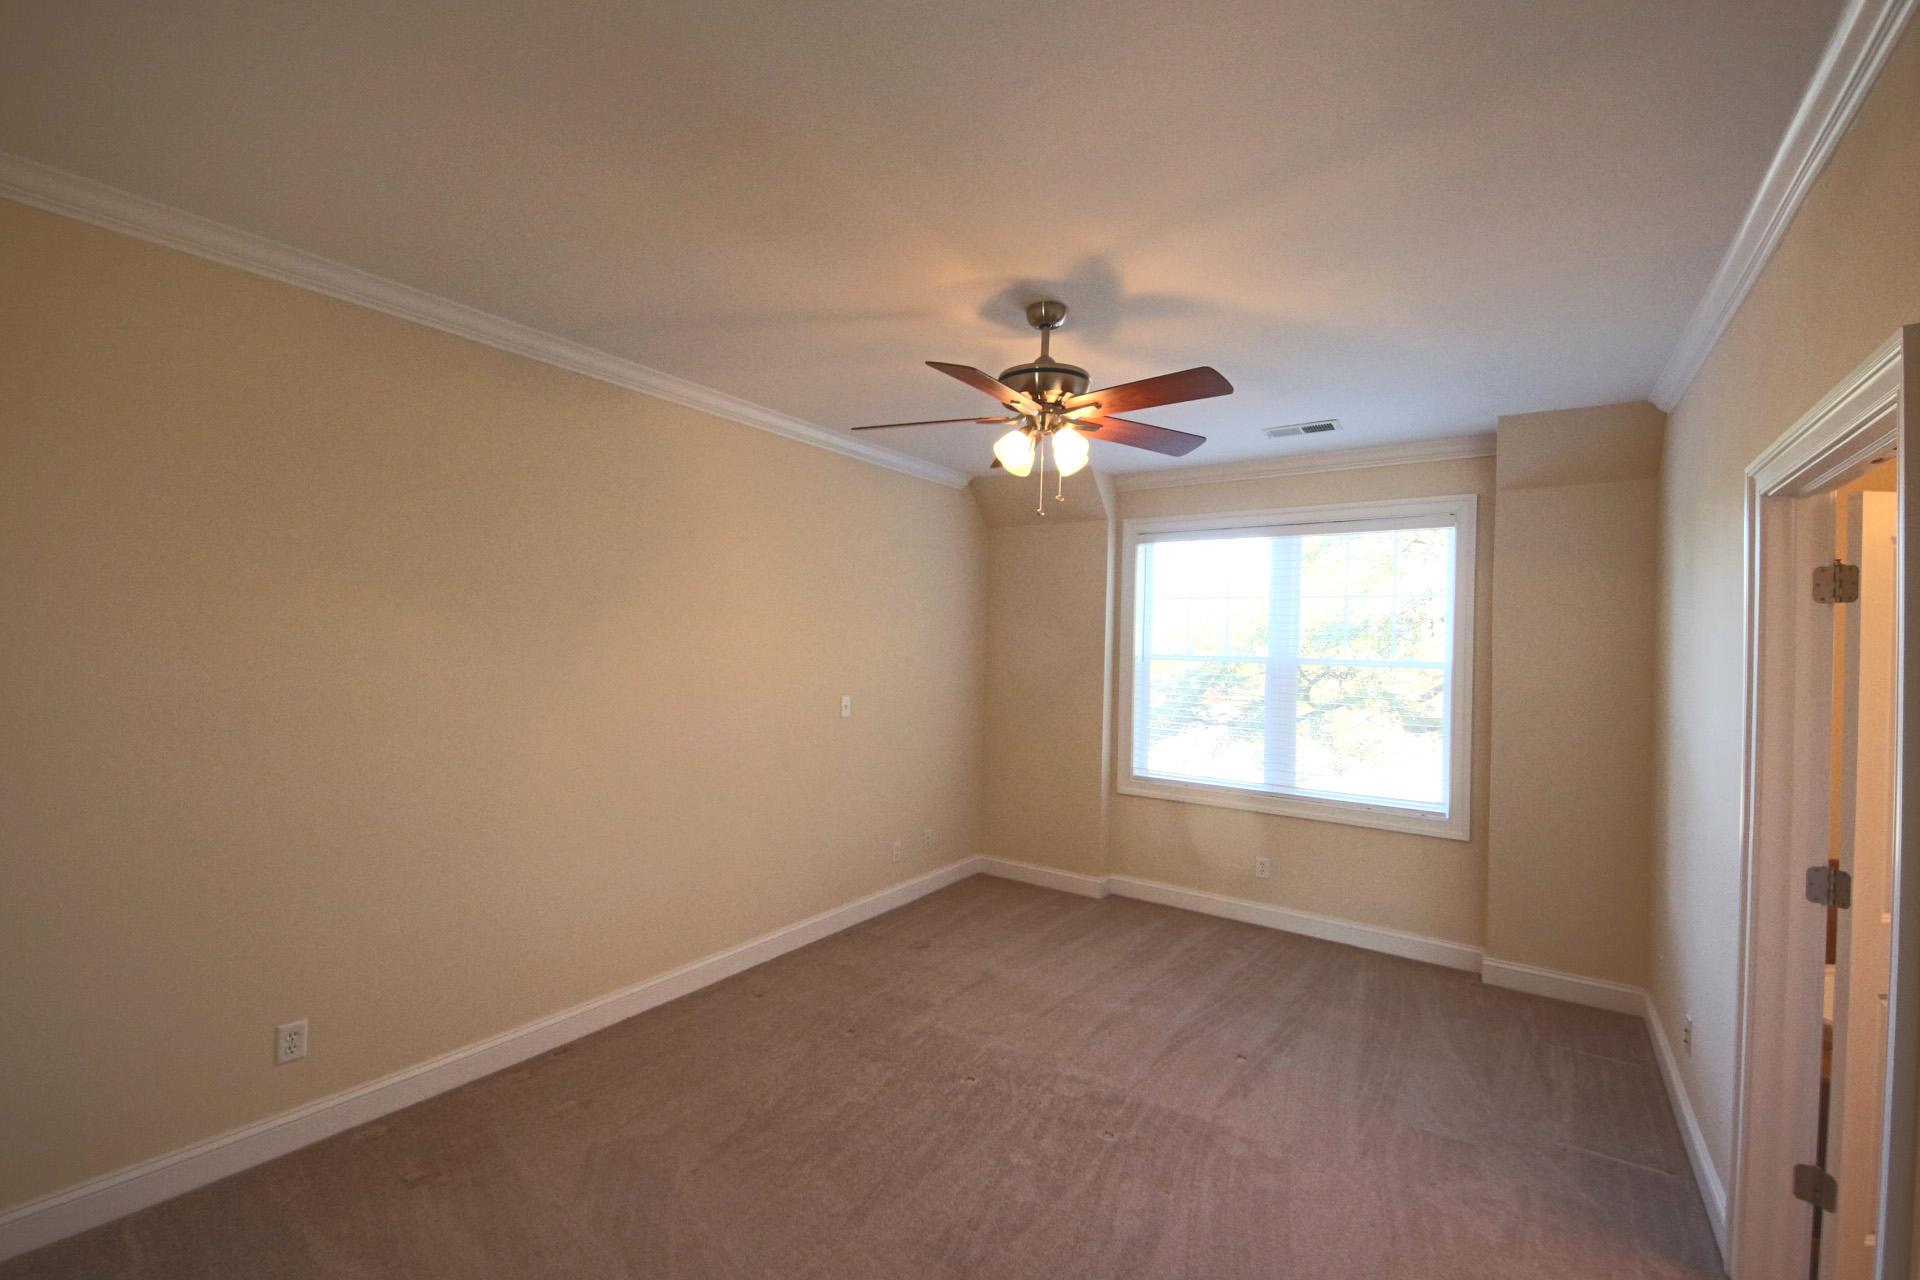 17. Master Bedroom